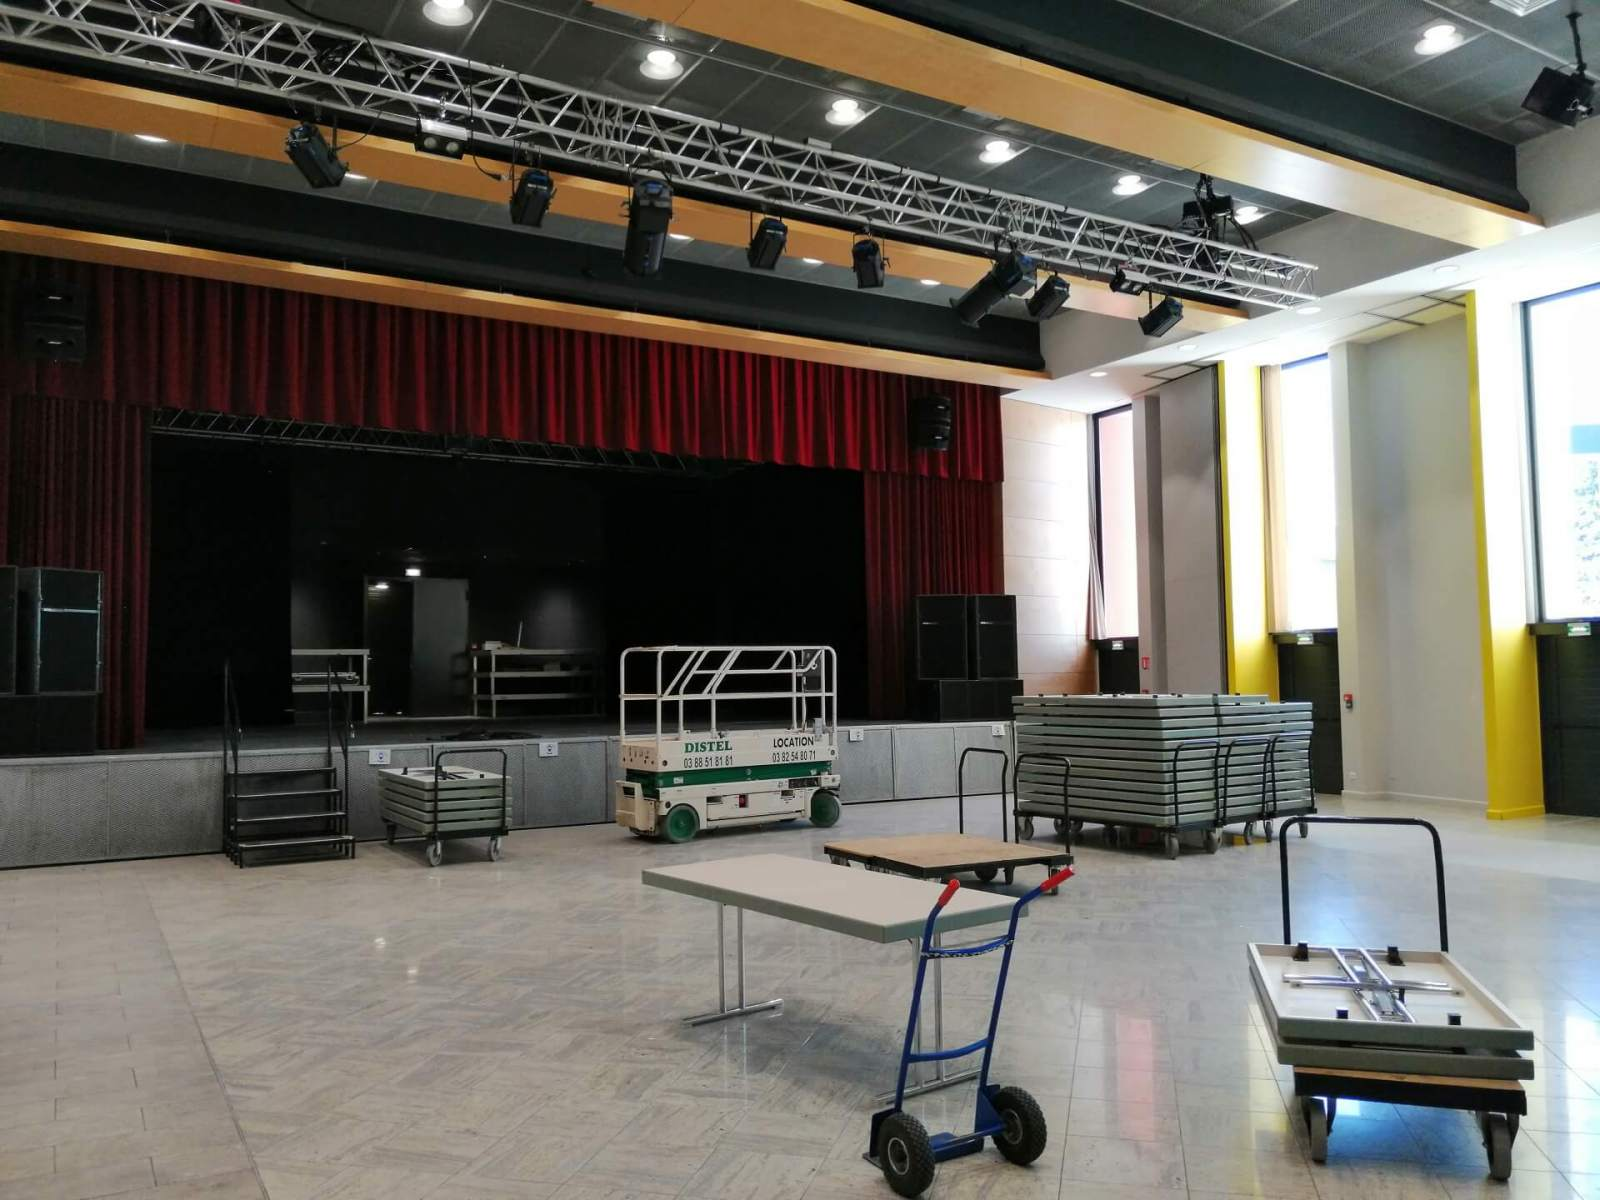 Salle-SocioCulturel-Moselle-NORD-2